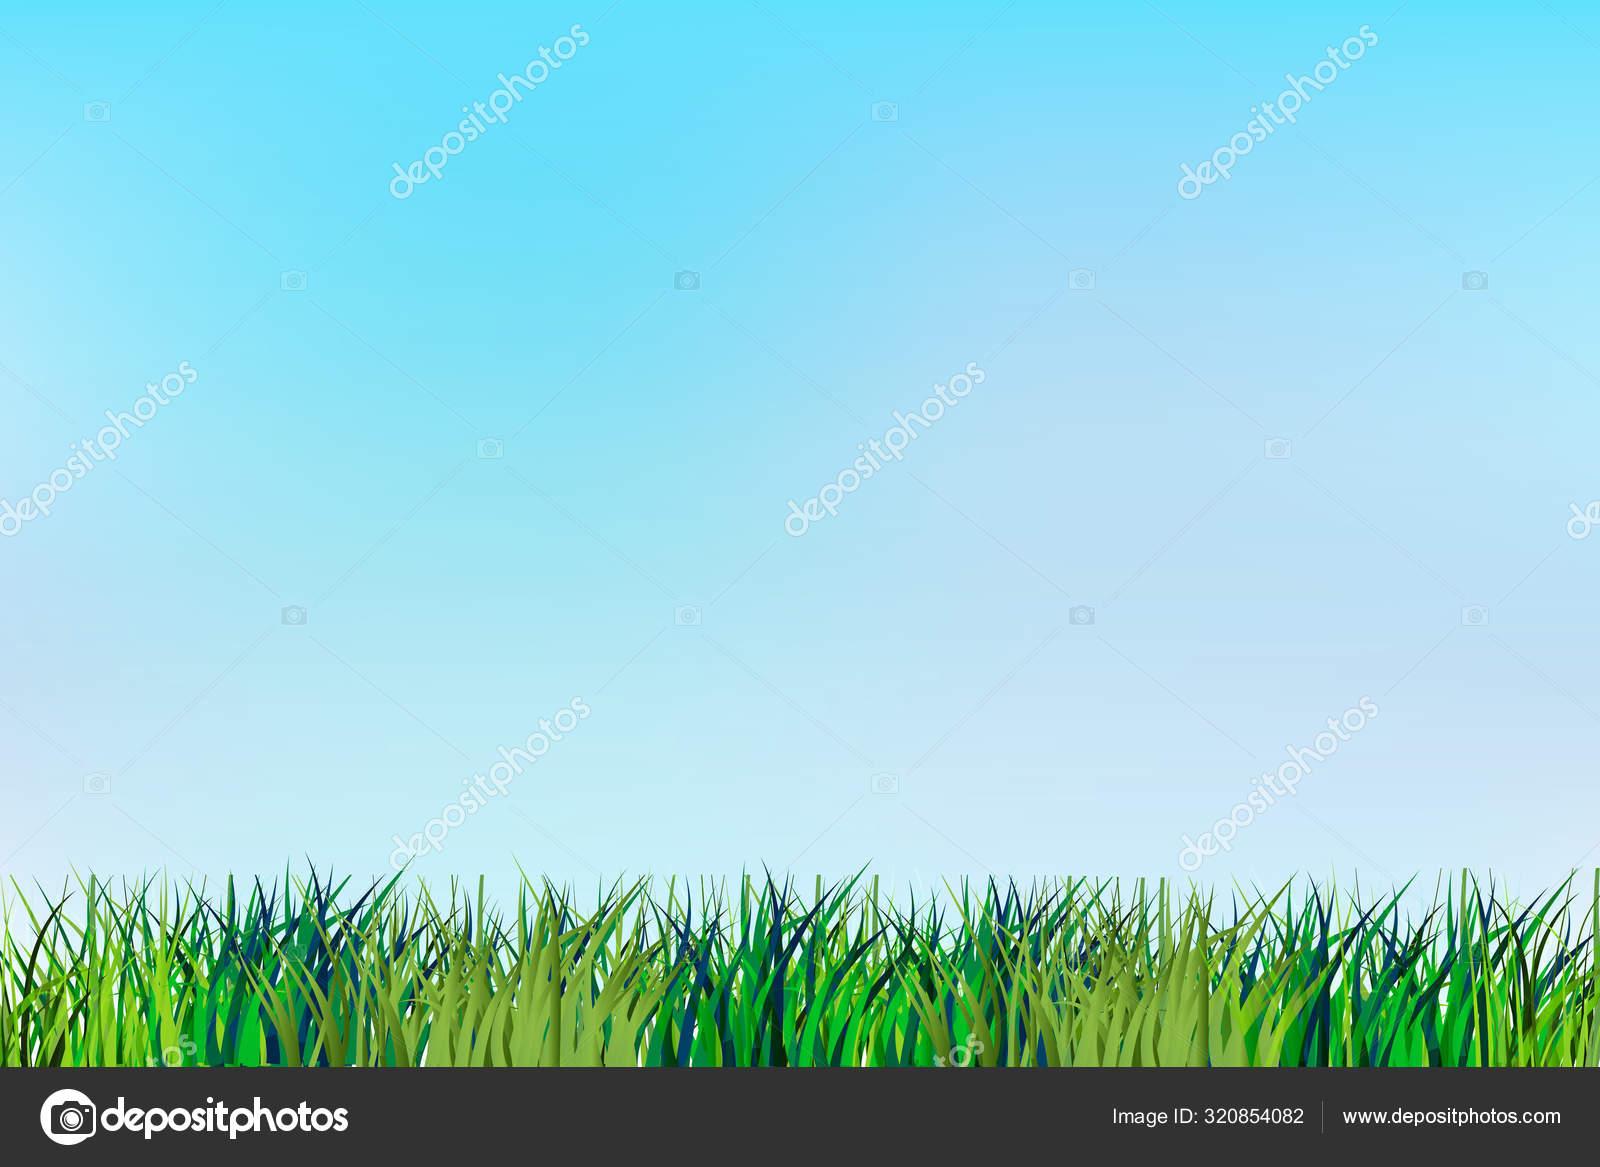 grass render vector background stock vector c glopphy 320854082 https depositphotos com 320854082 stock illustration grass render vector background html